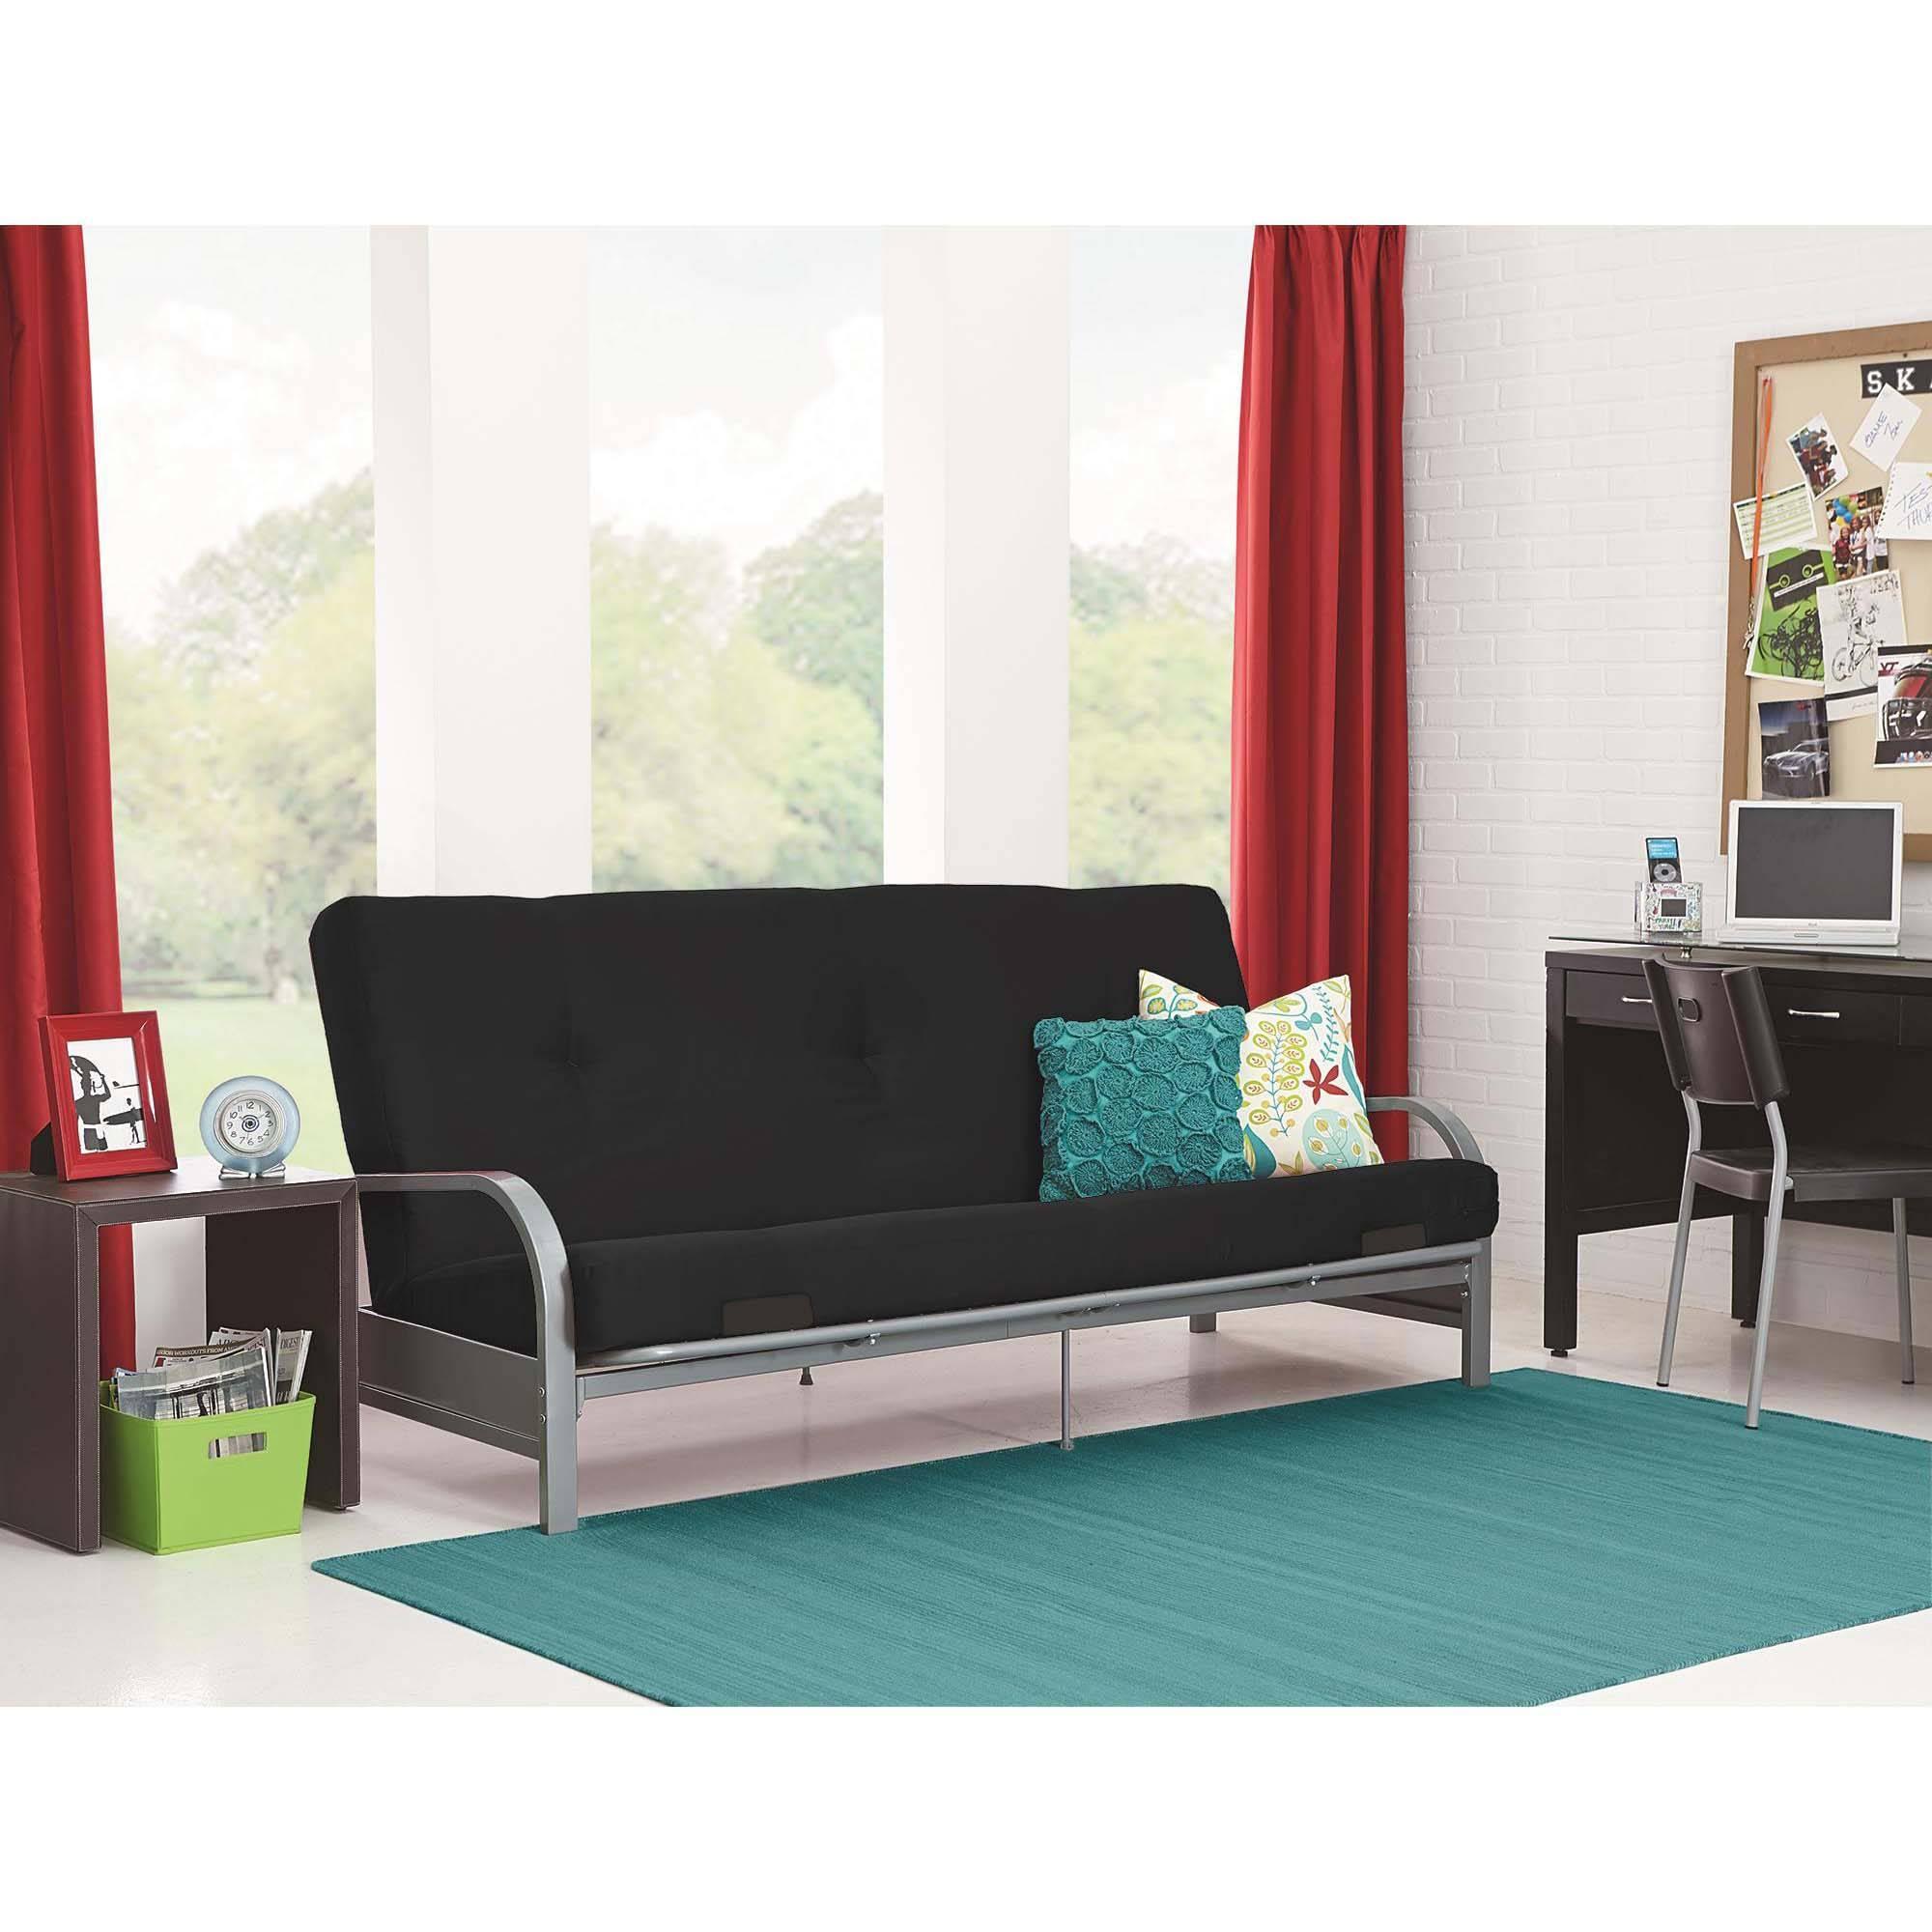 Futons - Walmart regarding Kmart Futon Beds (Image 12 of 15)